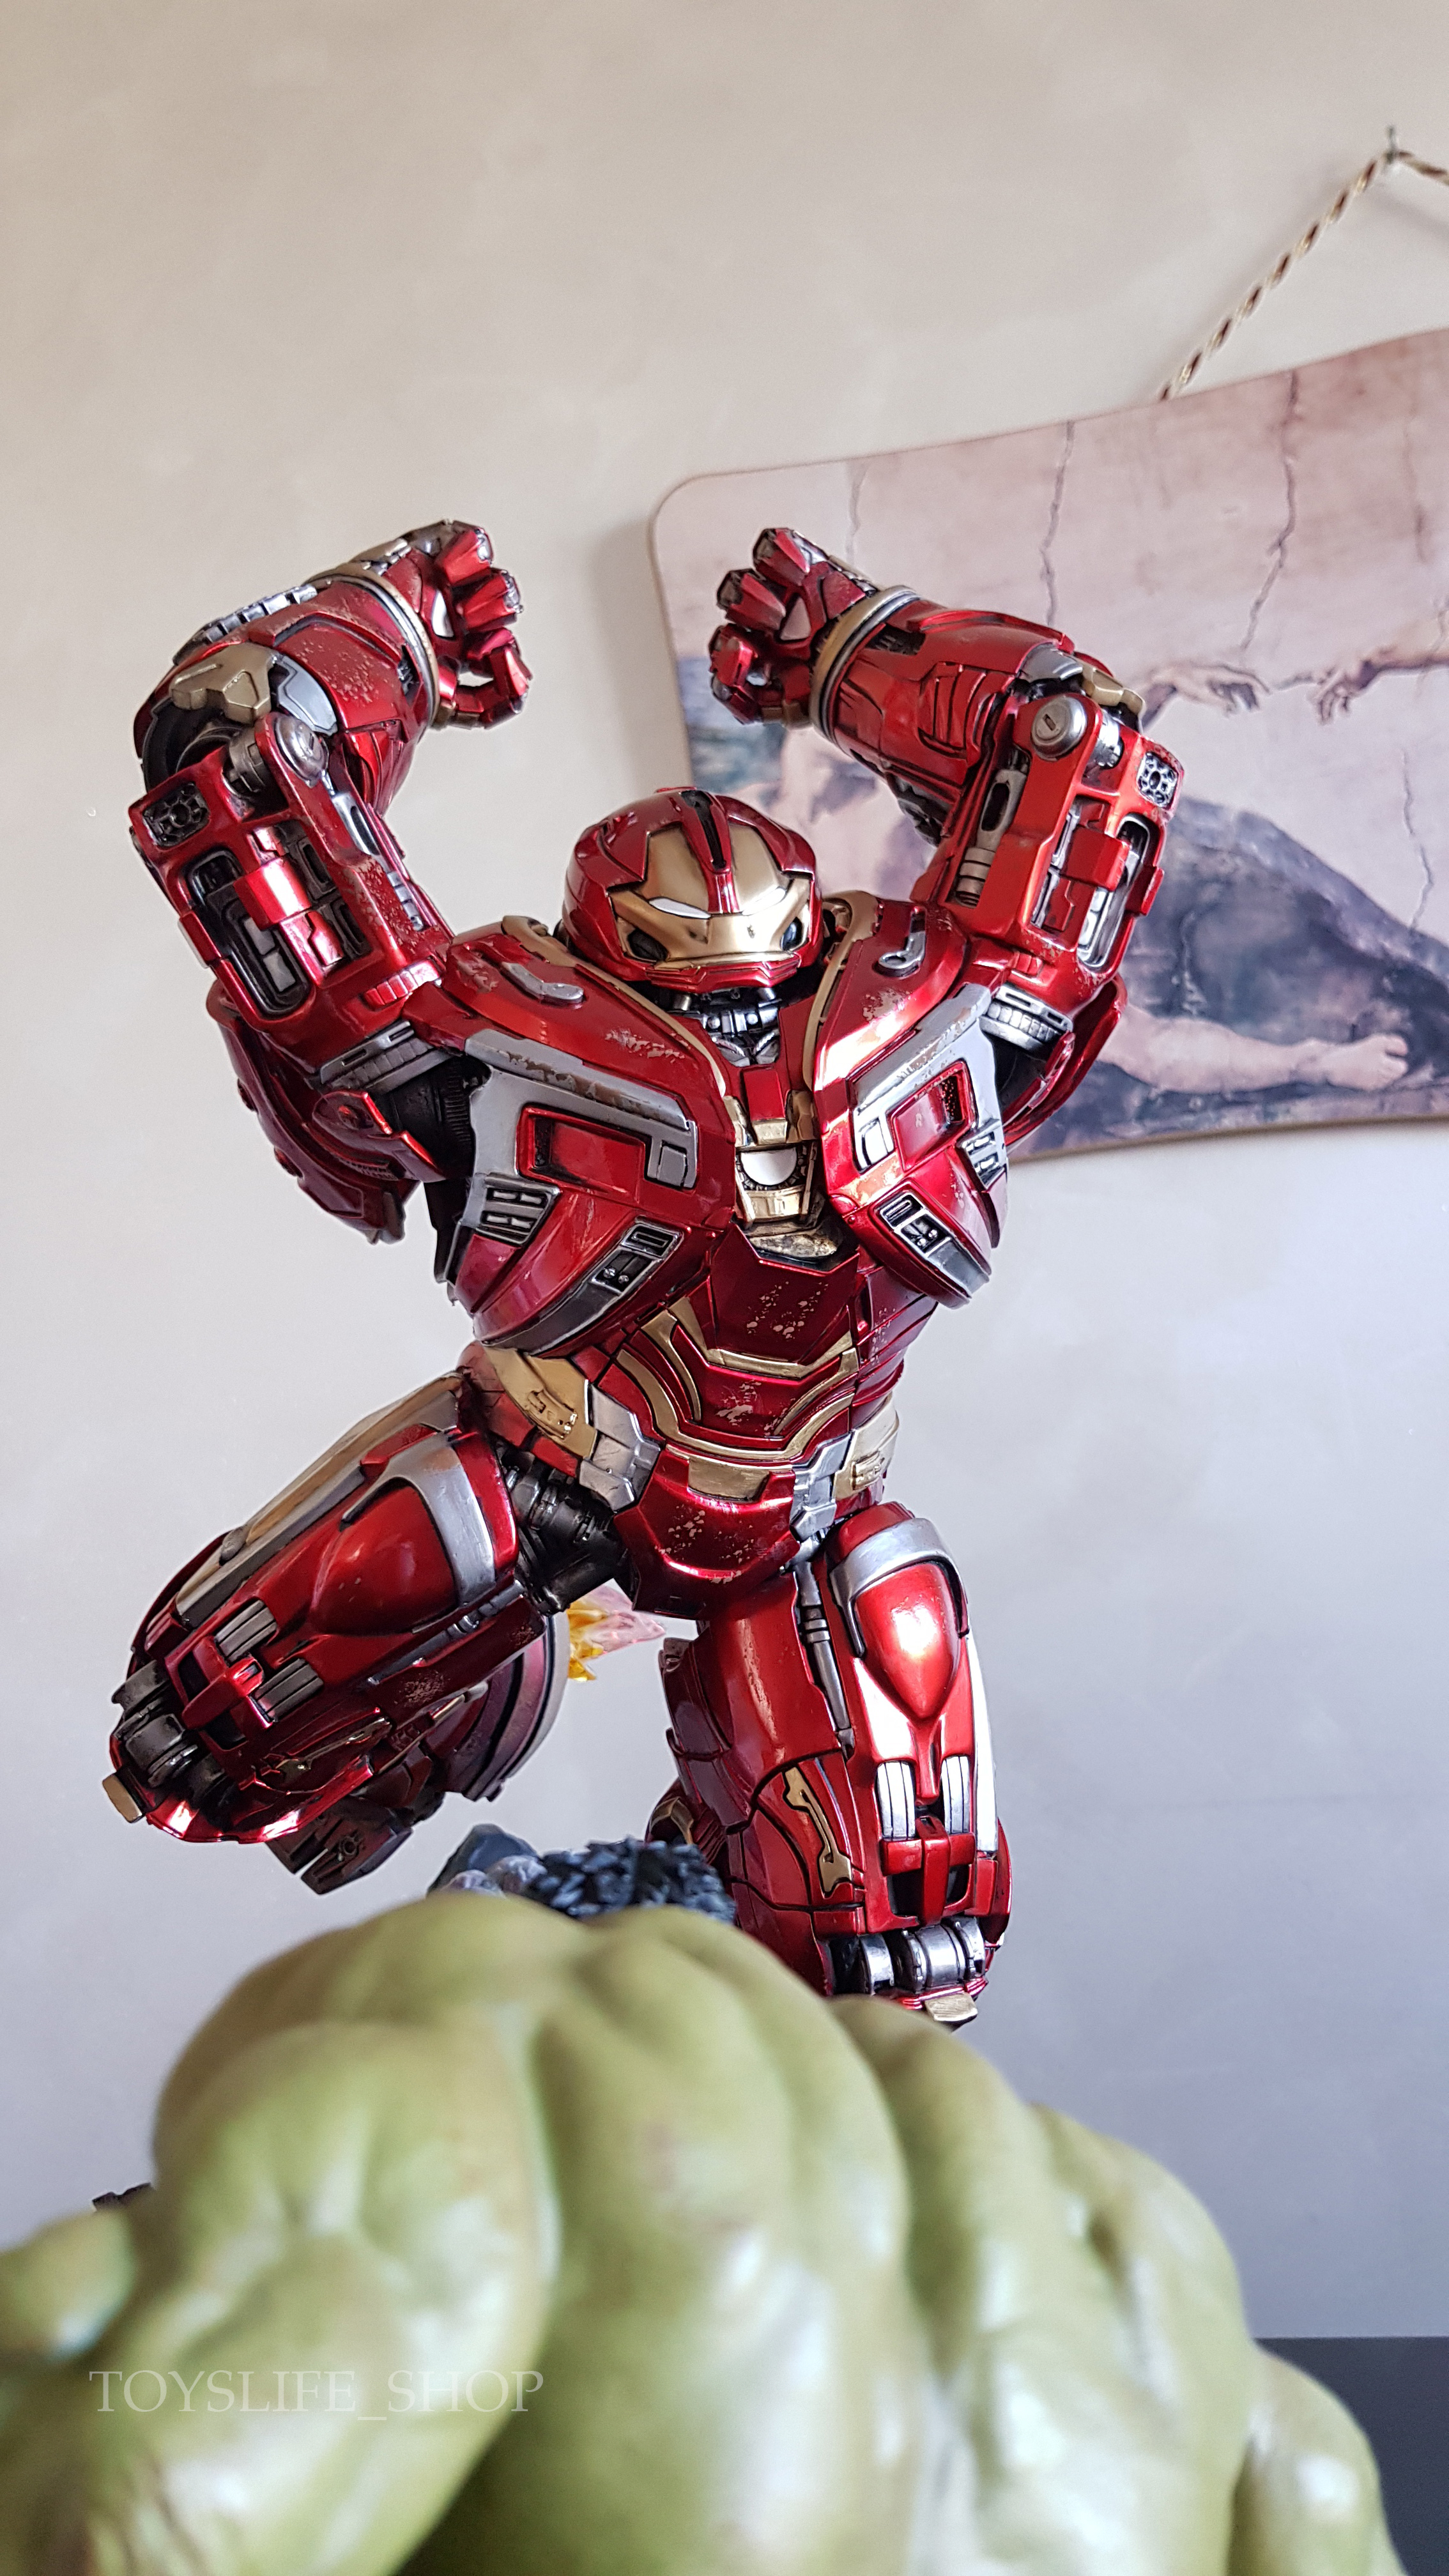 iron-studios-avengers-infinity-war-hulkbuster-1:10-statue-review-toyslife-13